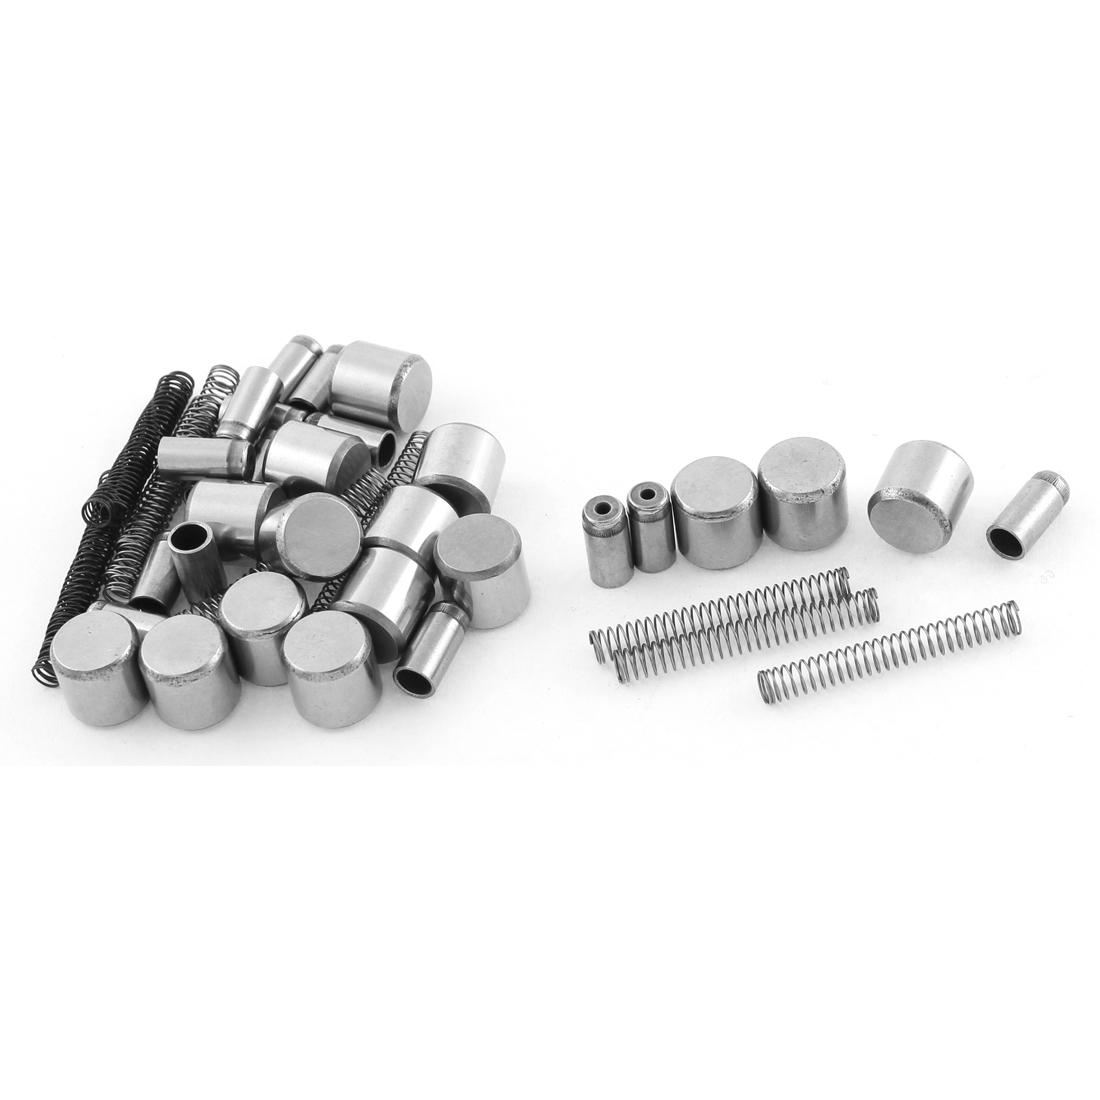 Motorcycle Engine Starter Clutch Roller Pin Spring Set CD-100 5 Pcs